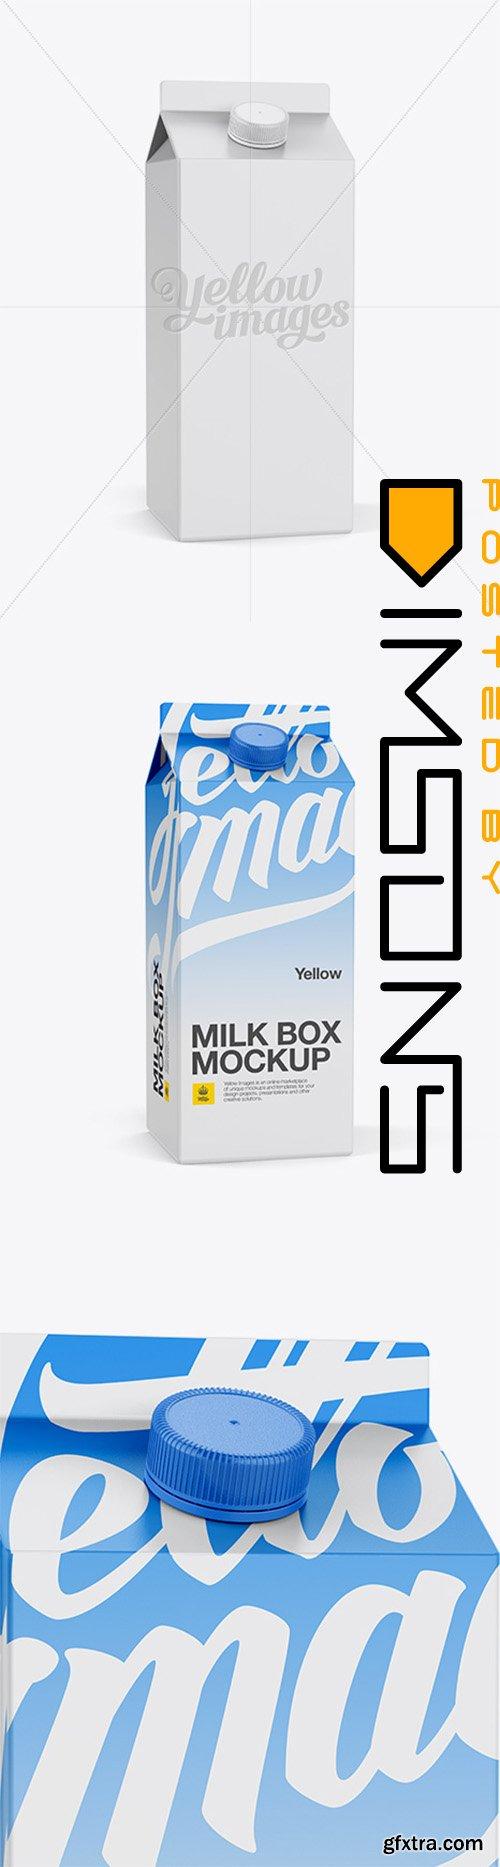 0.5 gal Milk Carton Mockup - Halfside View 14000